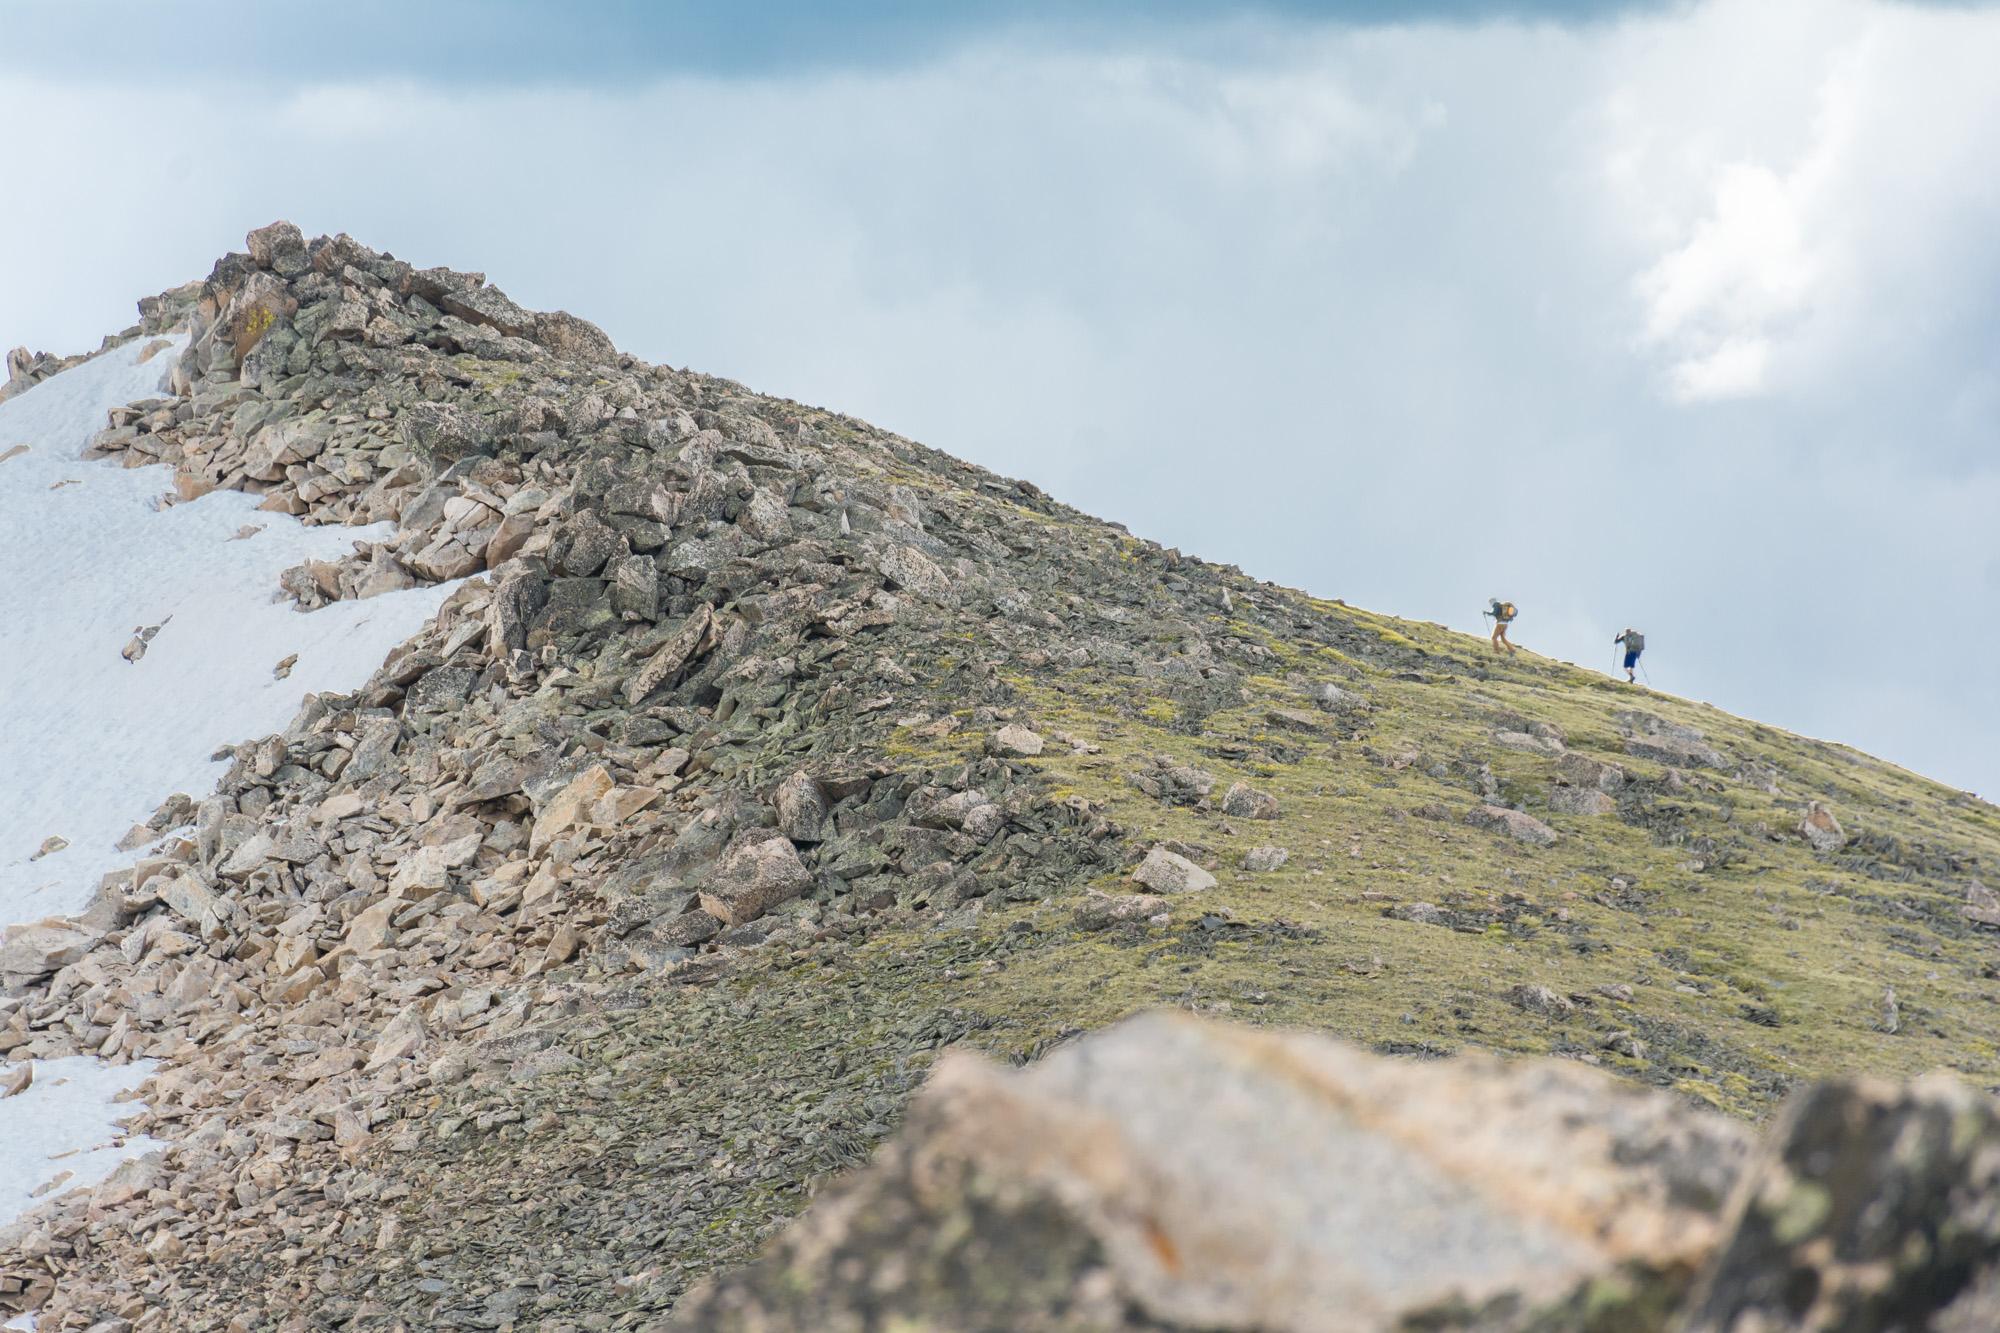 Mountain Sport Photography